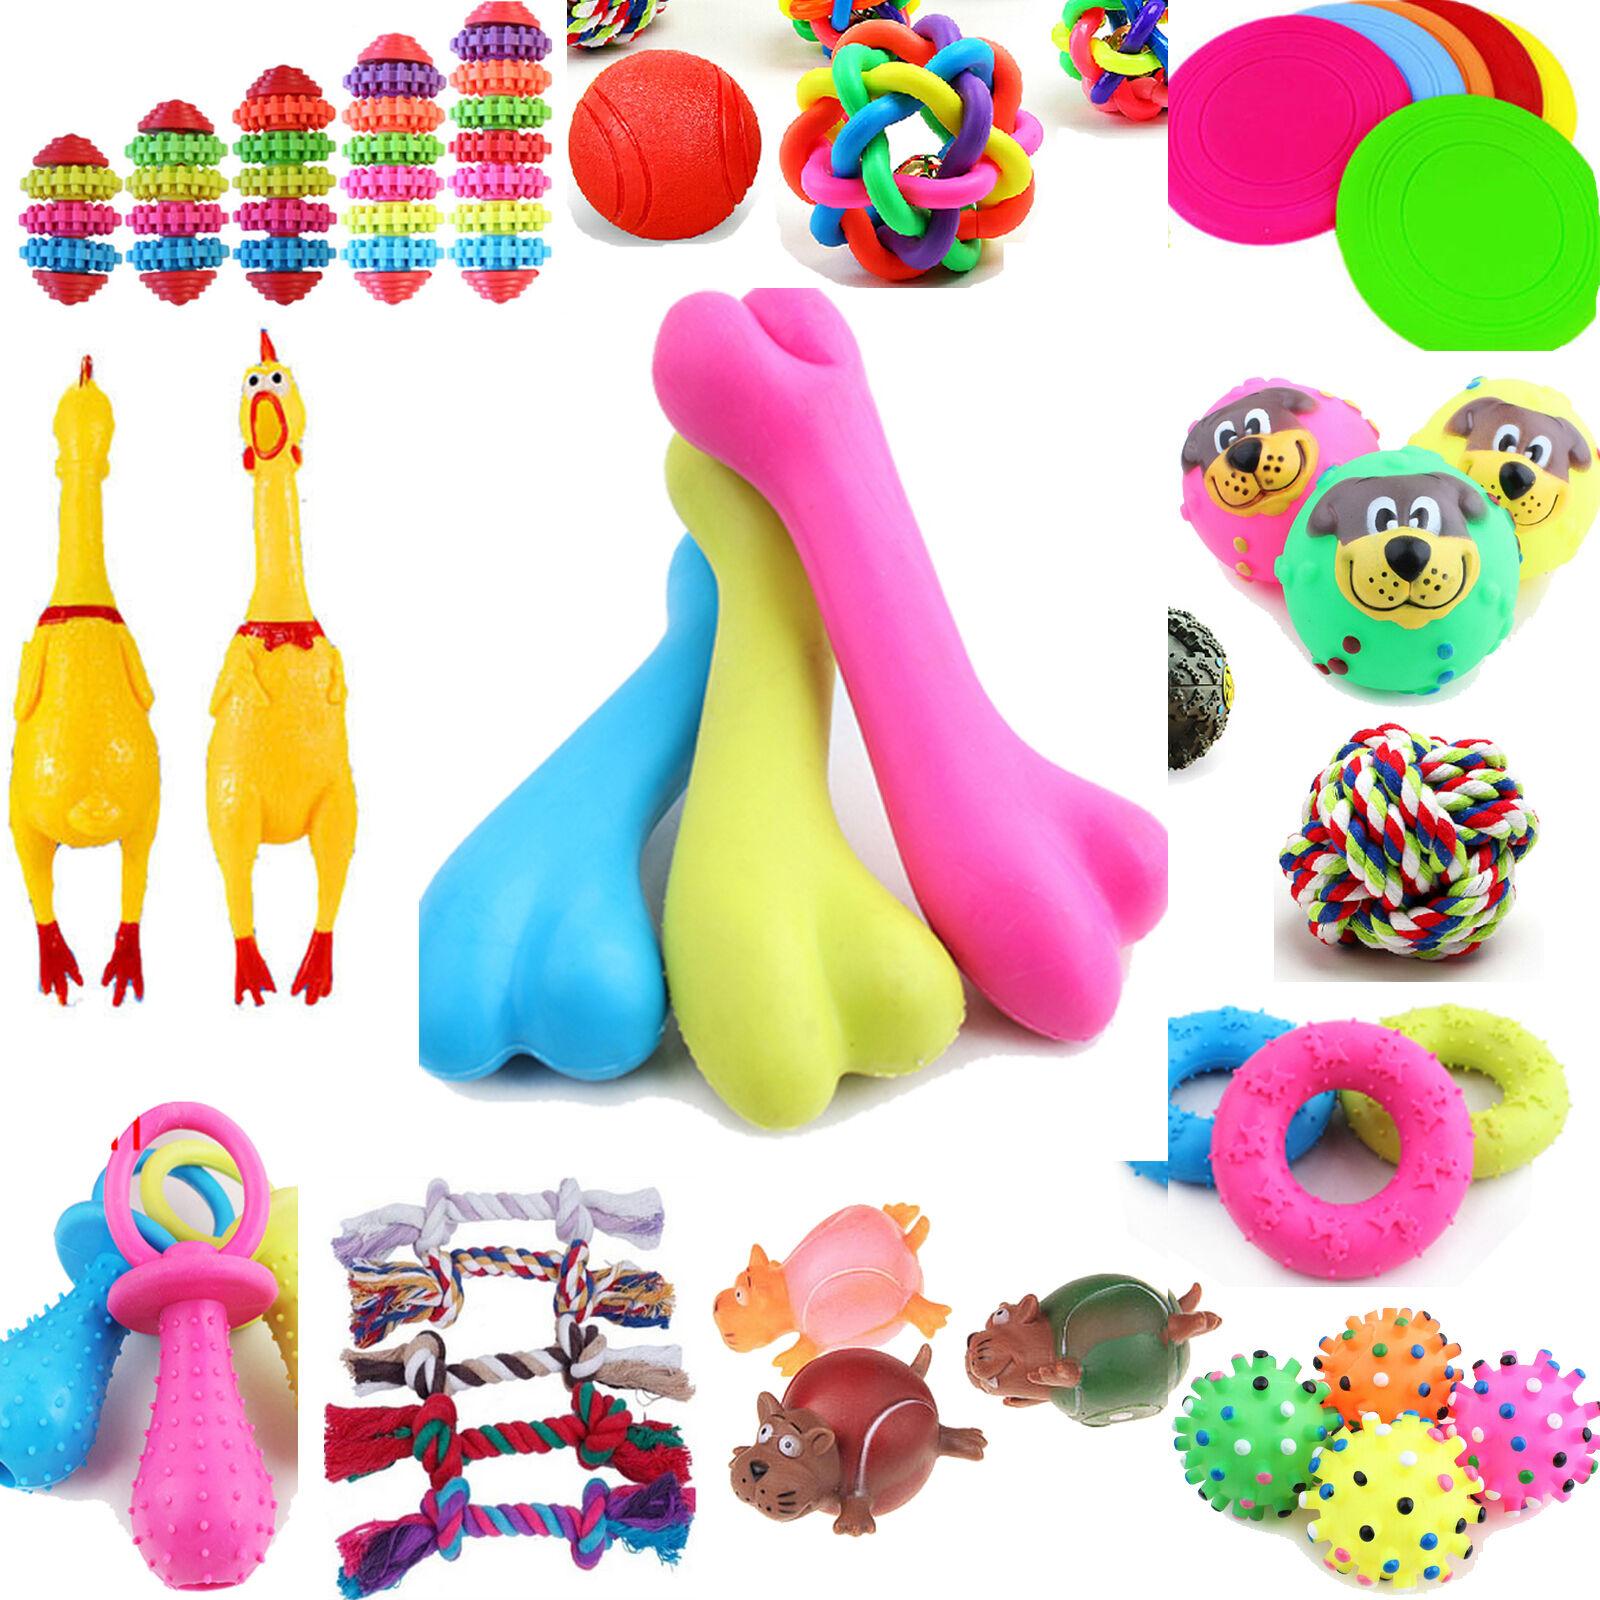 Toys Dog Supplies Pet Supplies